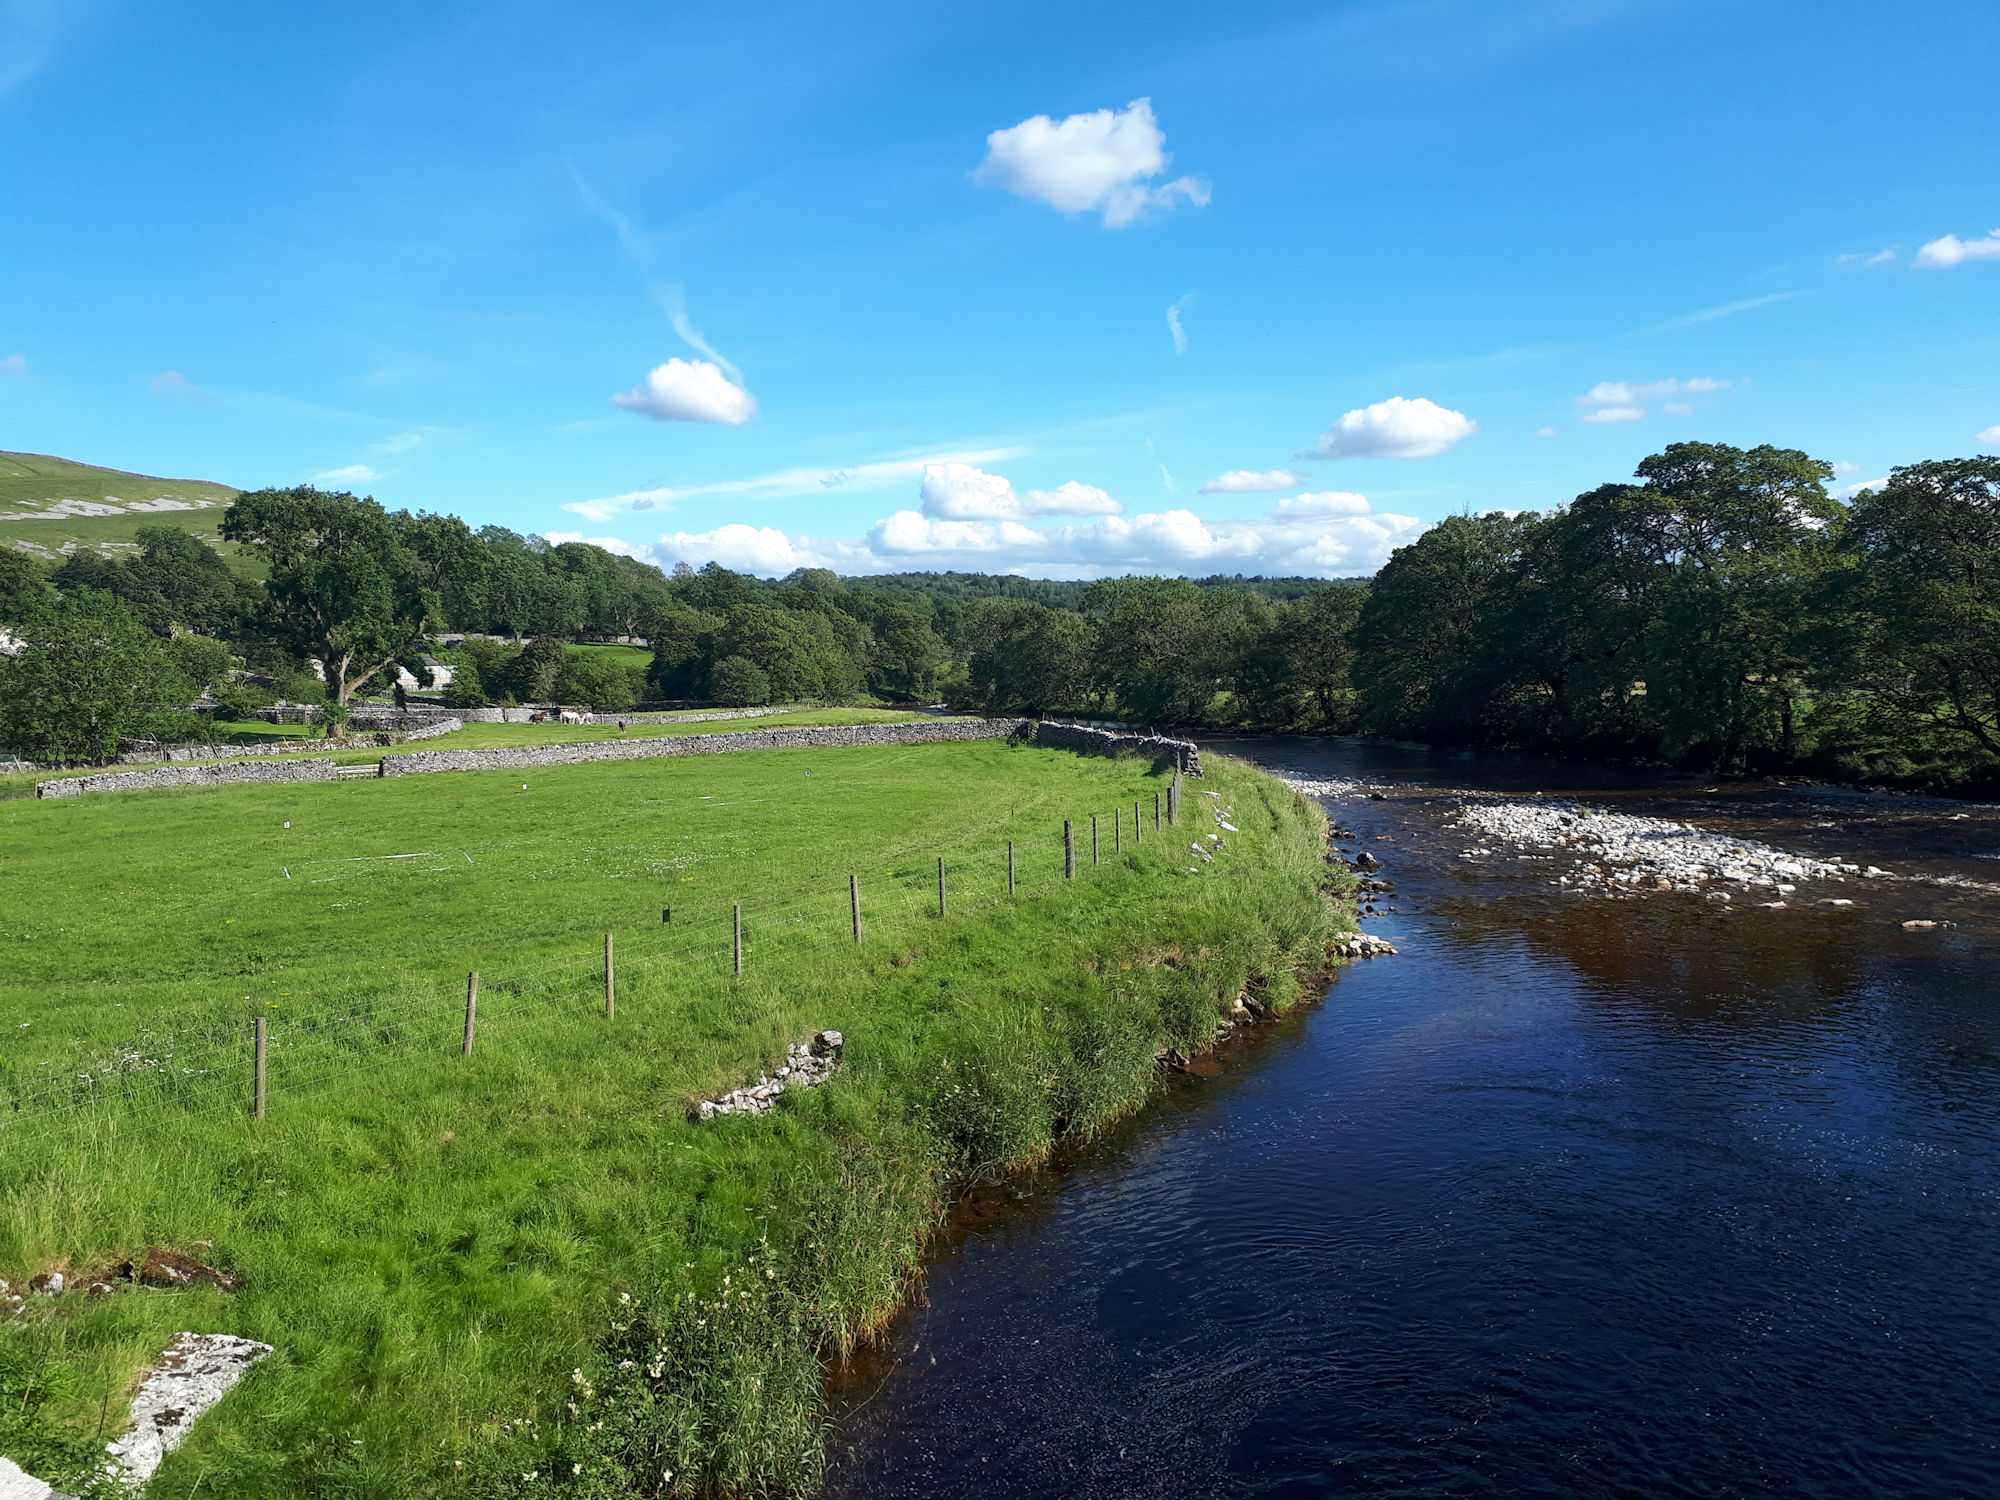 River Wharfe at Conistone